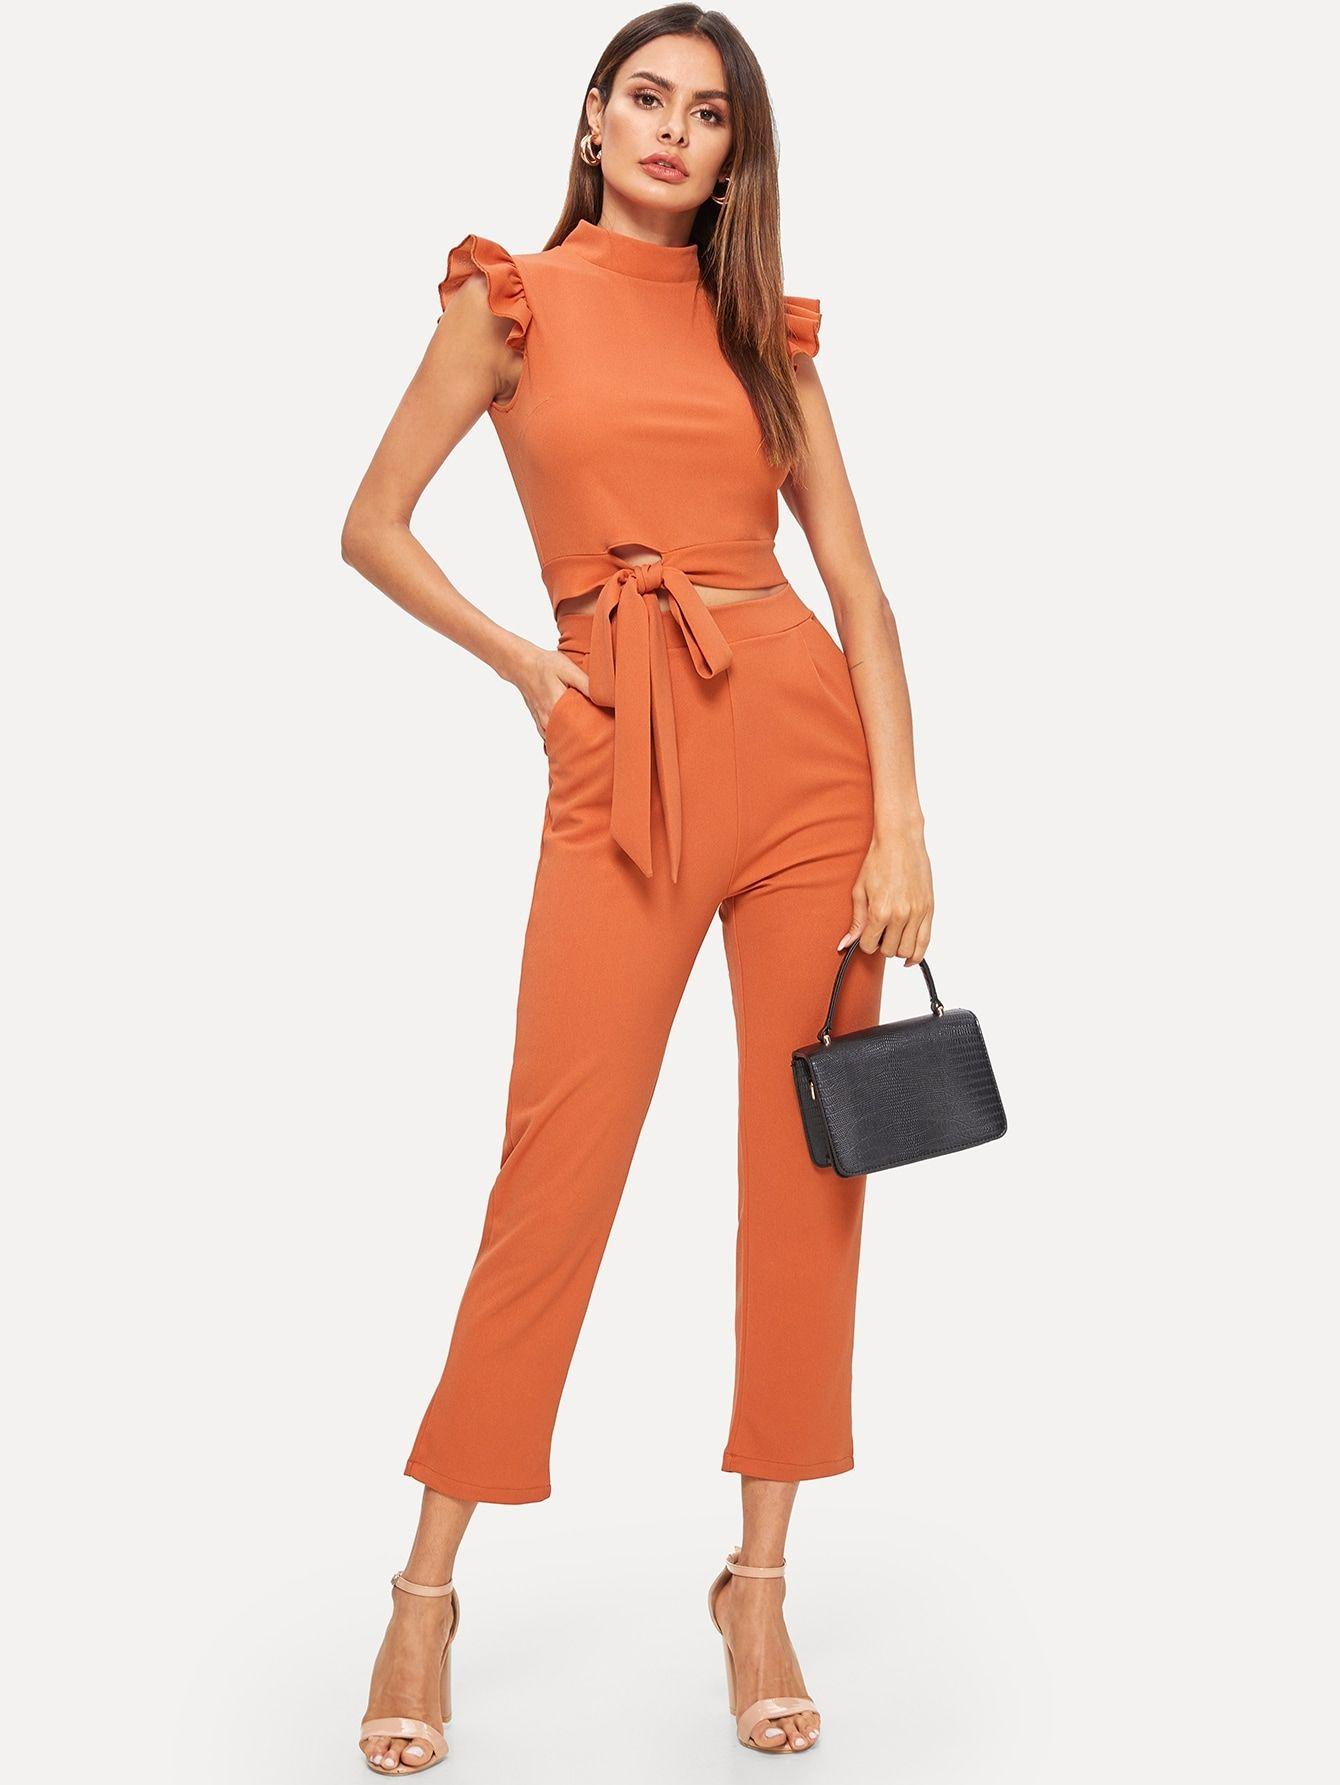 Women's Clothing Shein Flounce Foldover Top And Wide Leg Pants Set Women Summer Glamorous Highstr